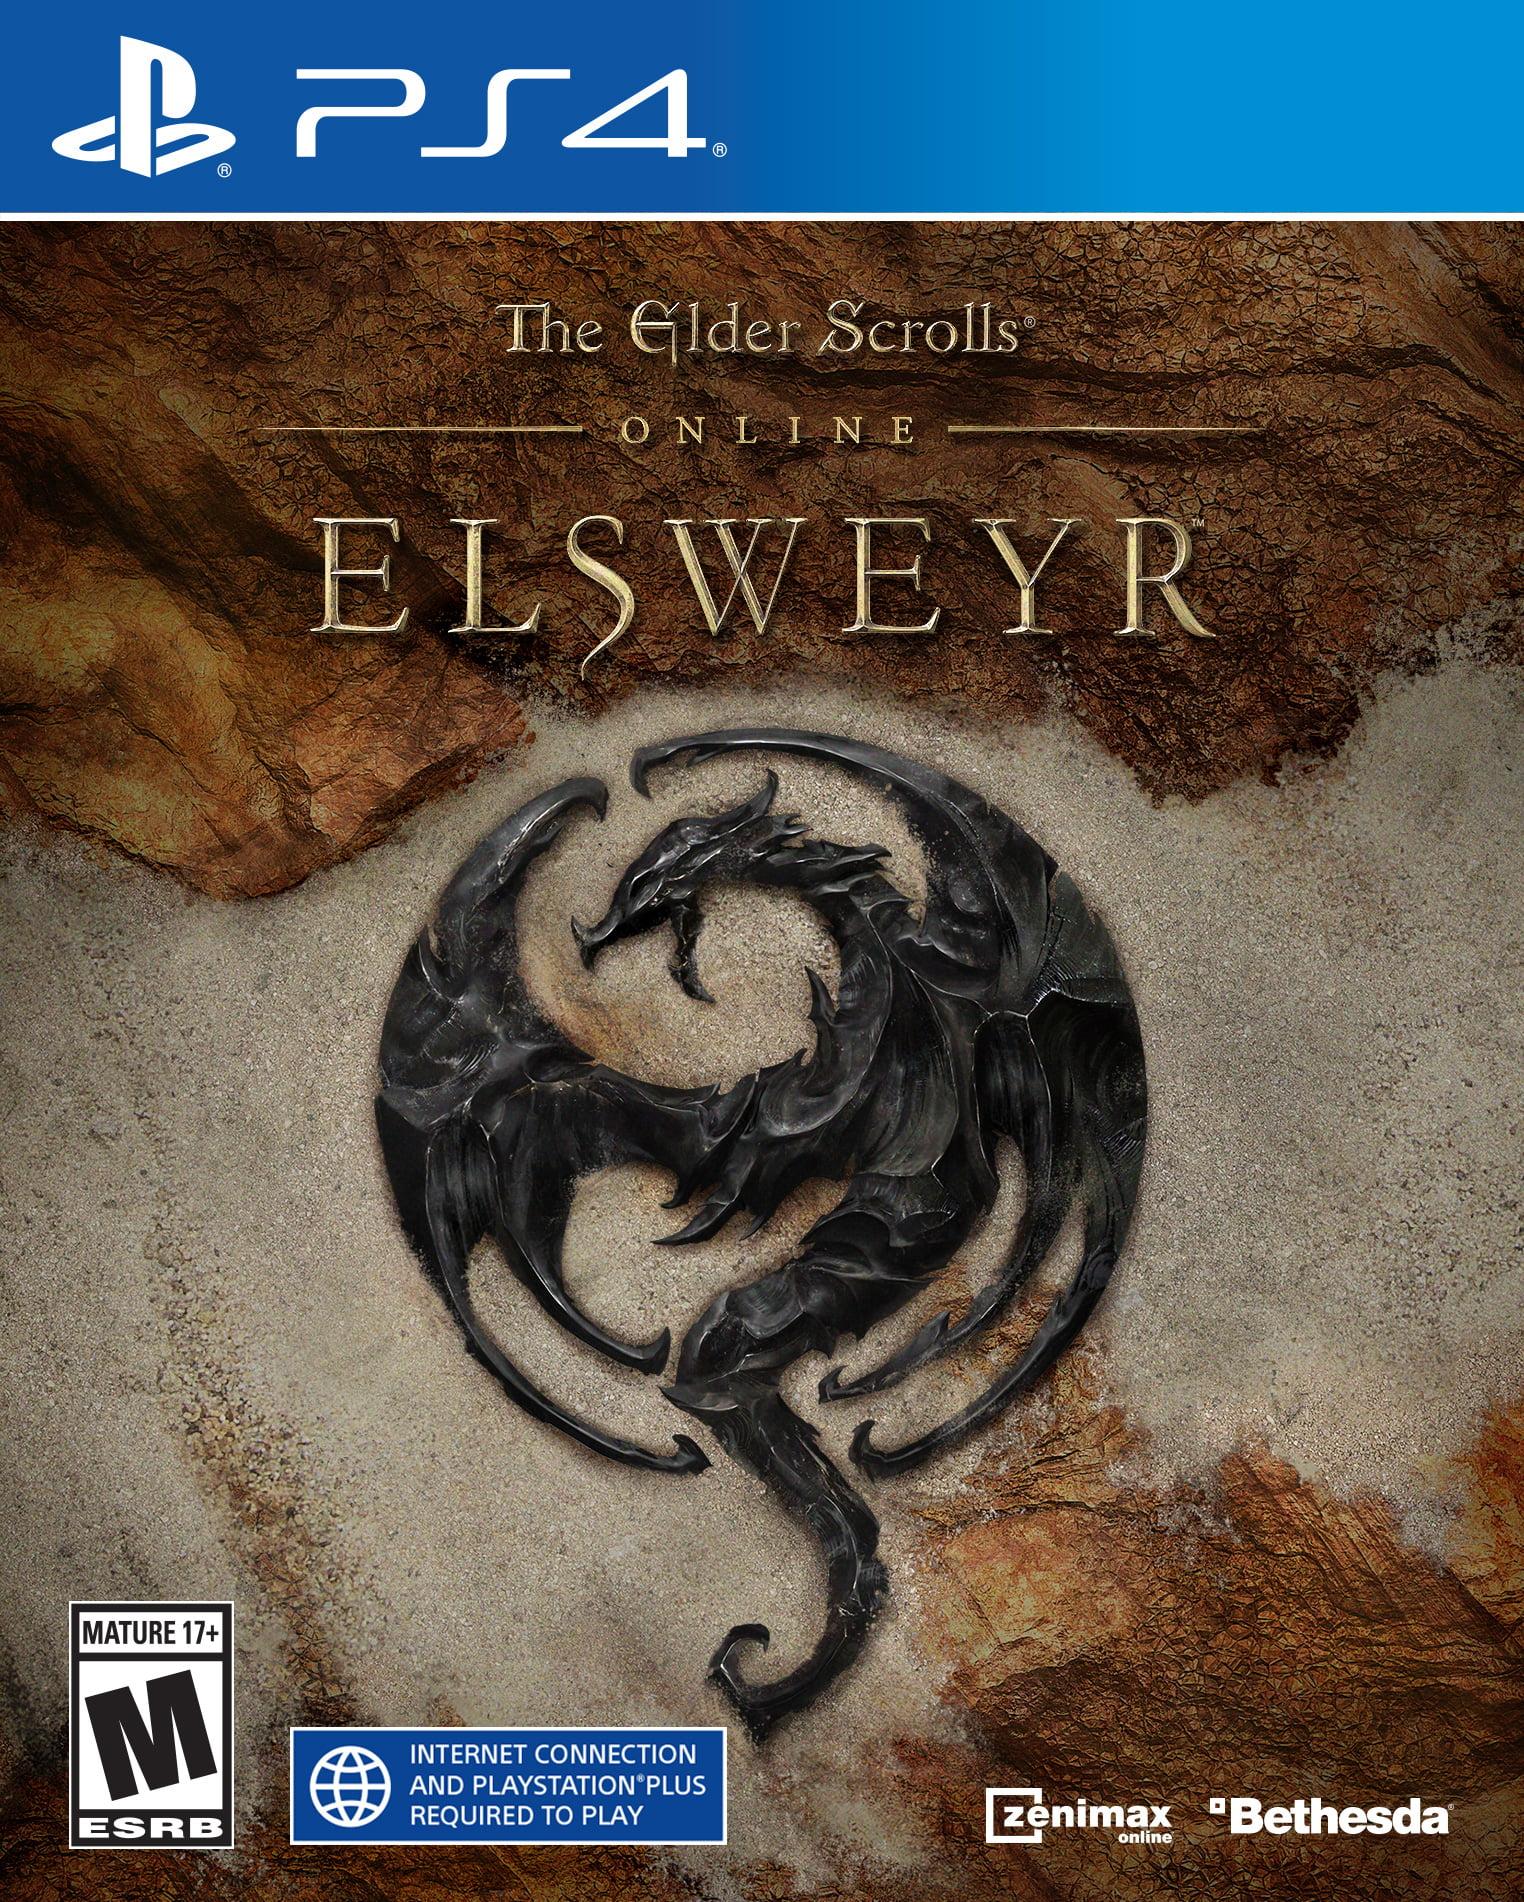 The Elder Scrolls Online: Elsweyr, Bethesda, PlayStation 4, 093155174702